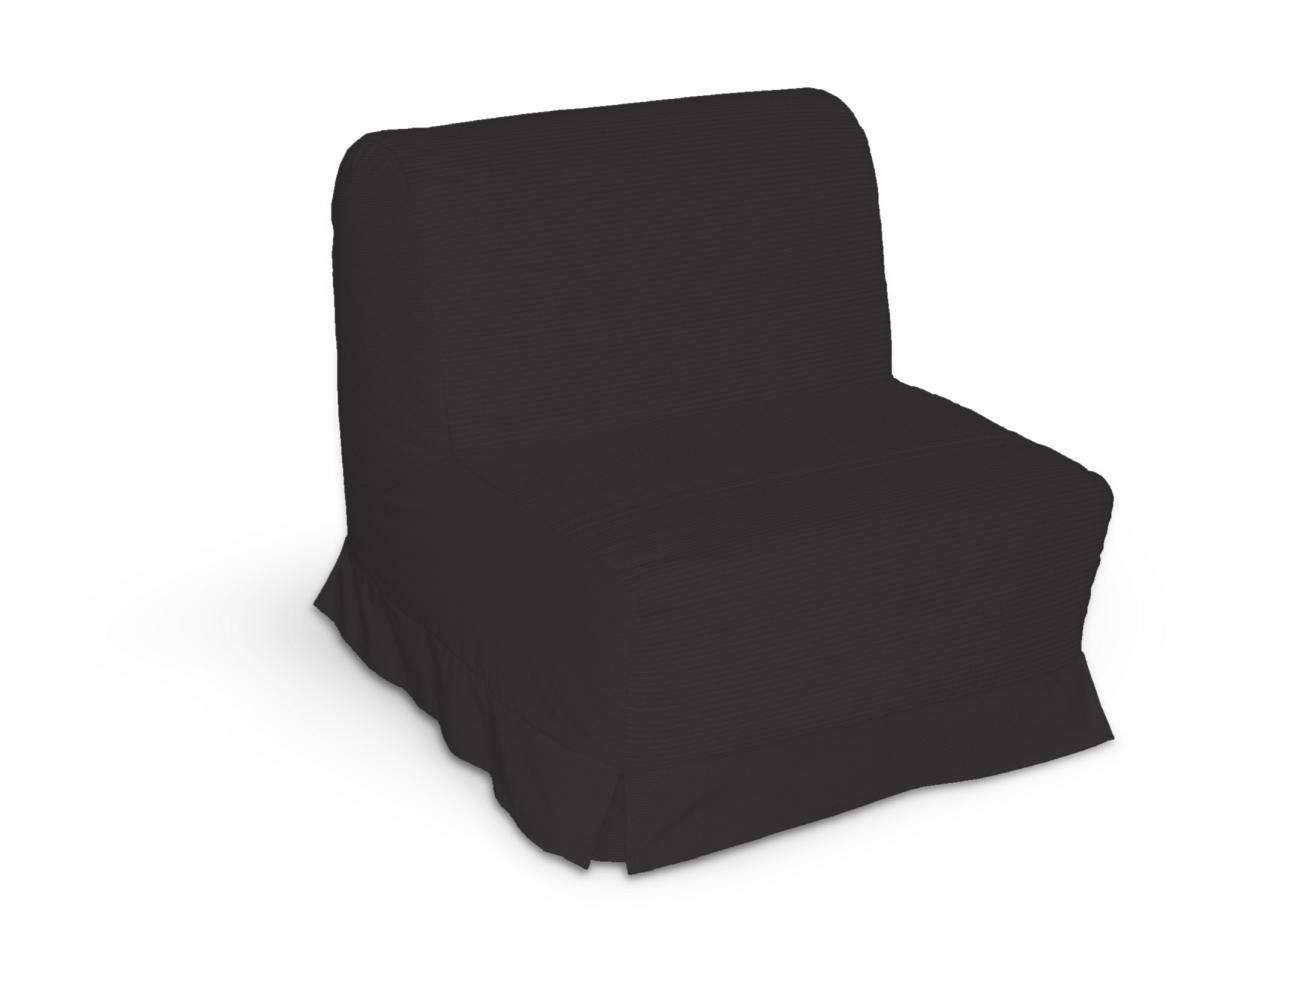 Lycksele Sesselbezug mit Kellerfalten Lycksele von der Kollektion Cotton Panama, Stoff: 702-08